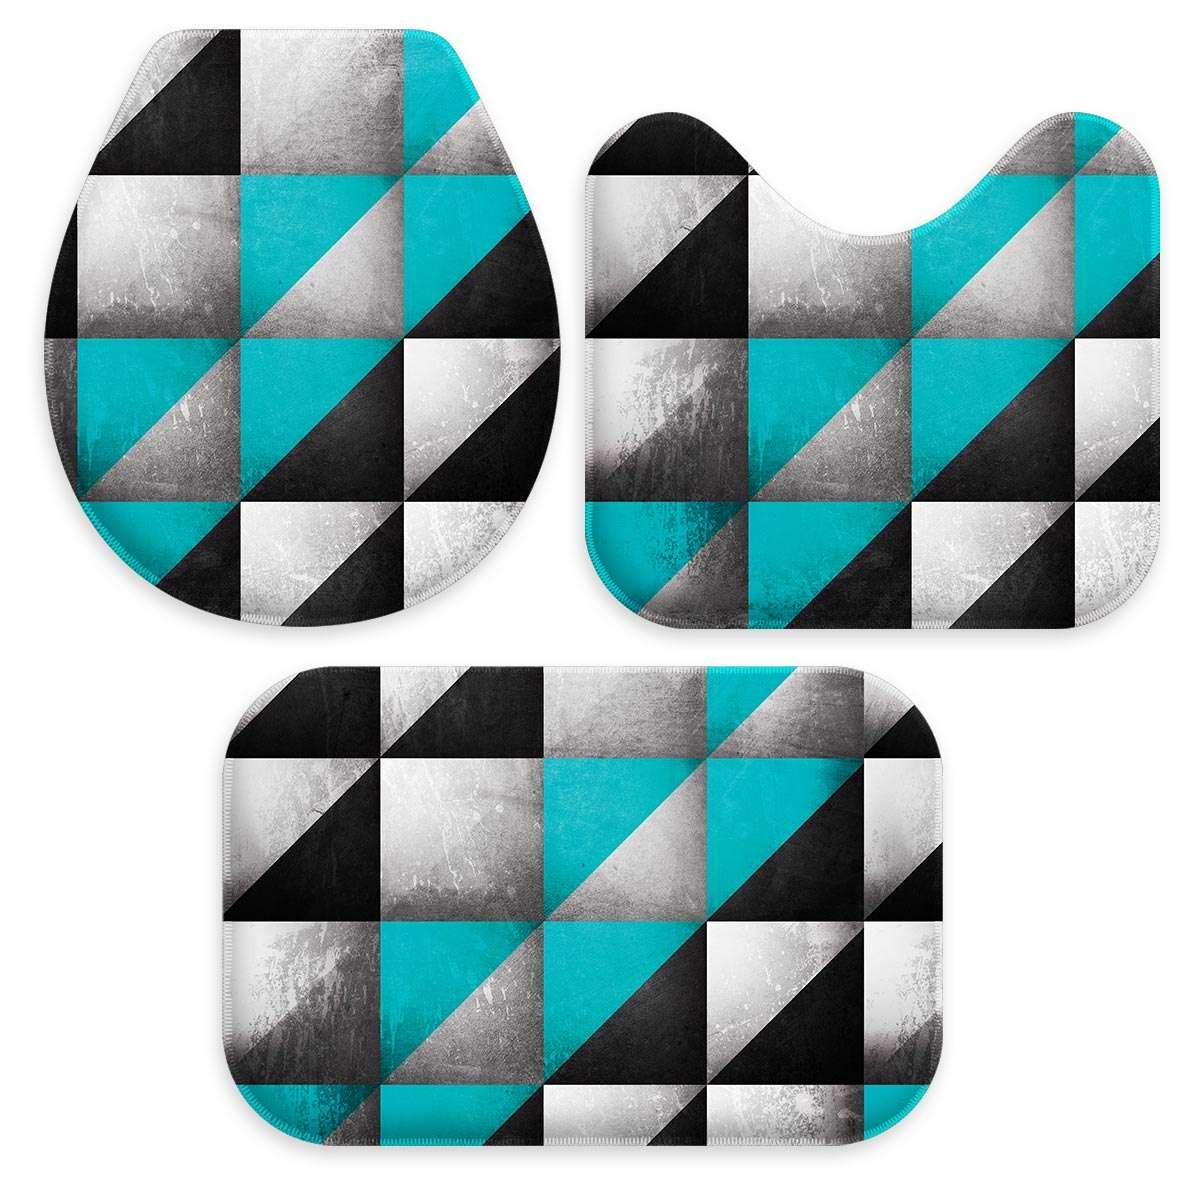 98c2d9ff4 Kit 3 Tapetes Decorativos para Banheiro Geometrico